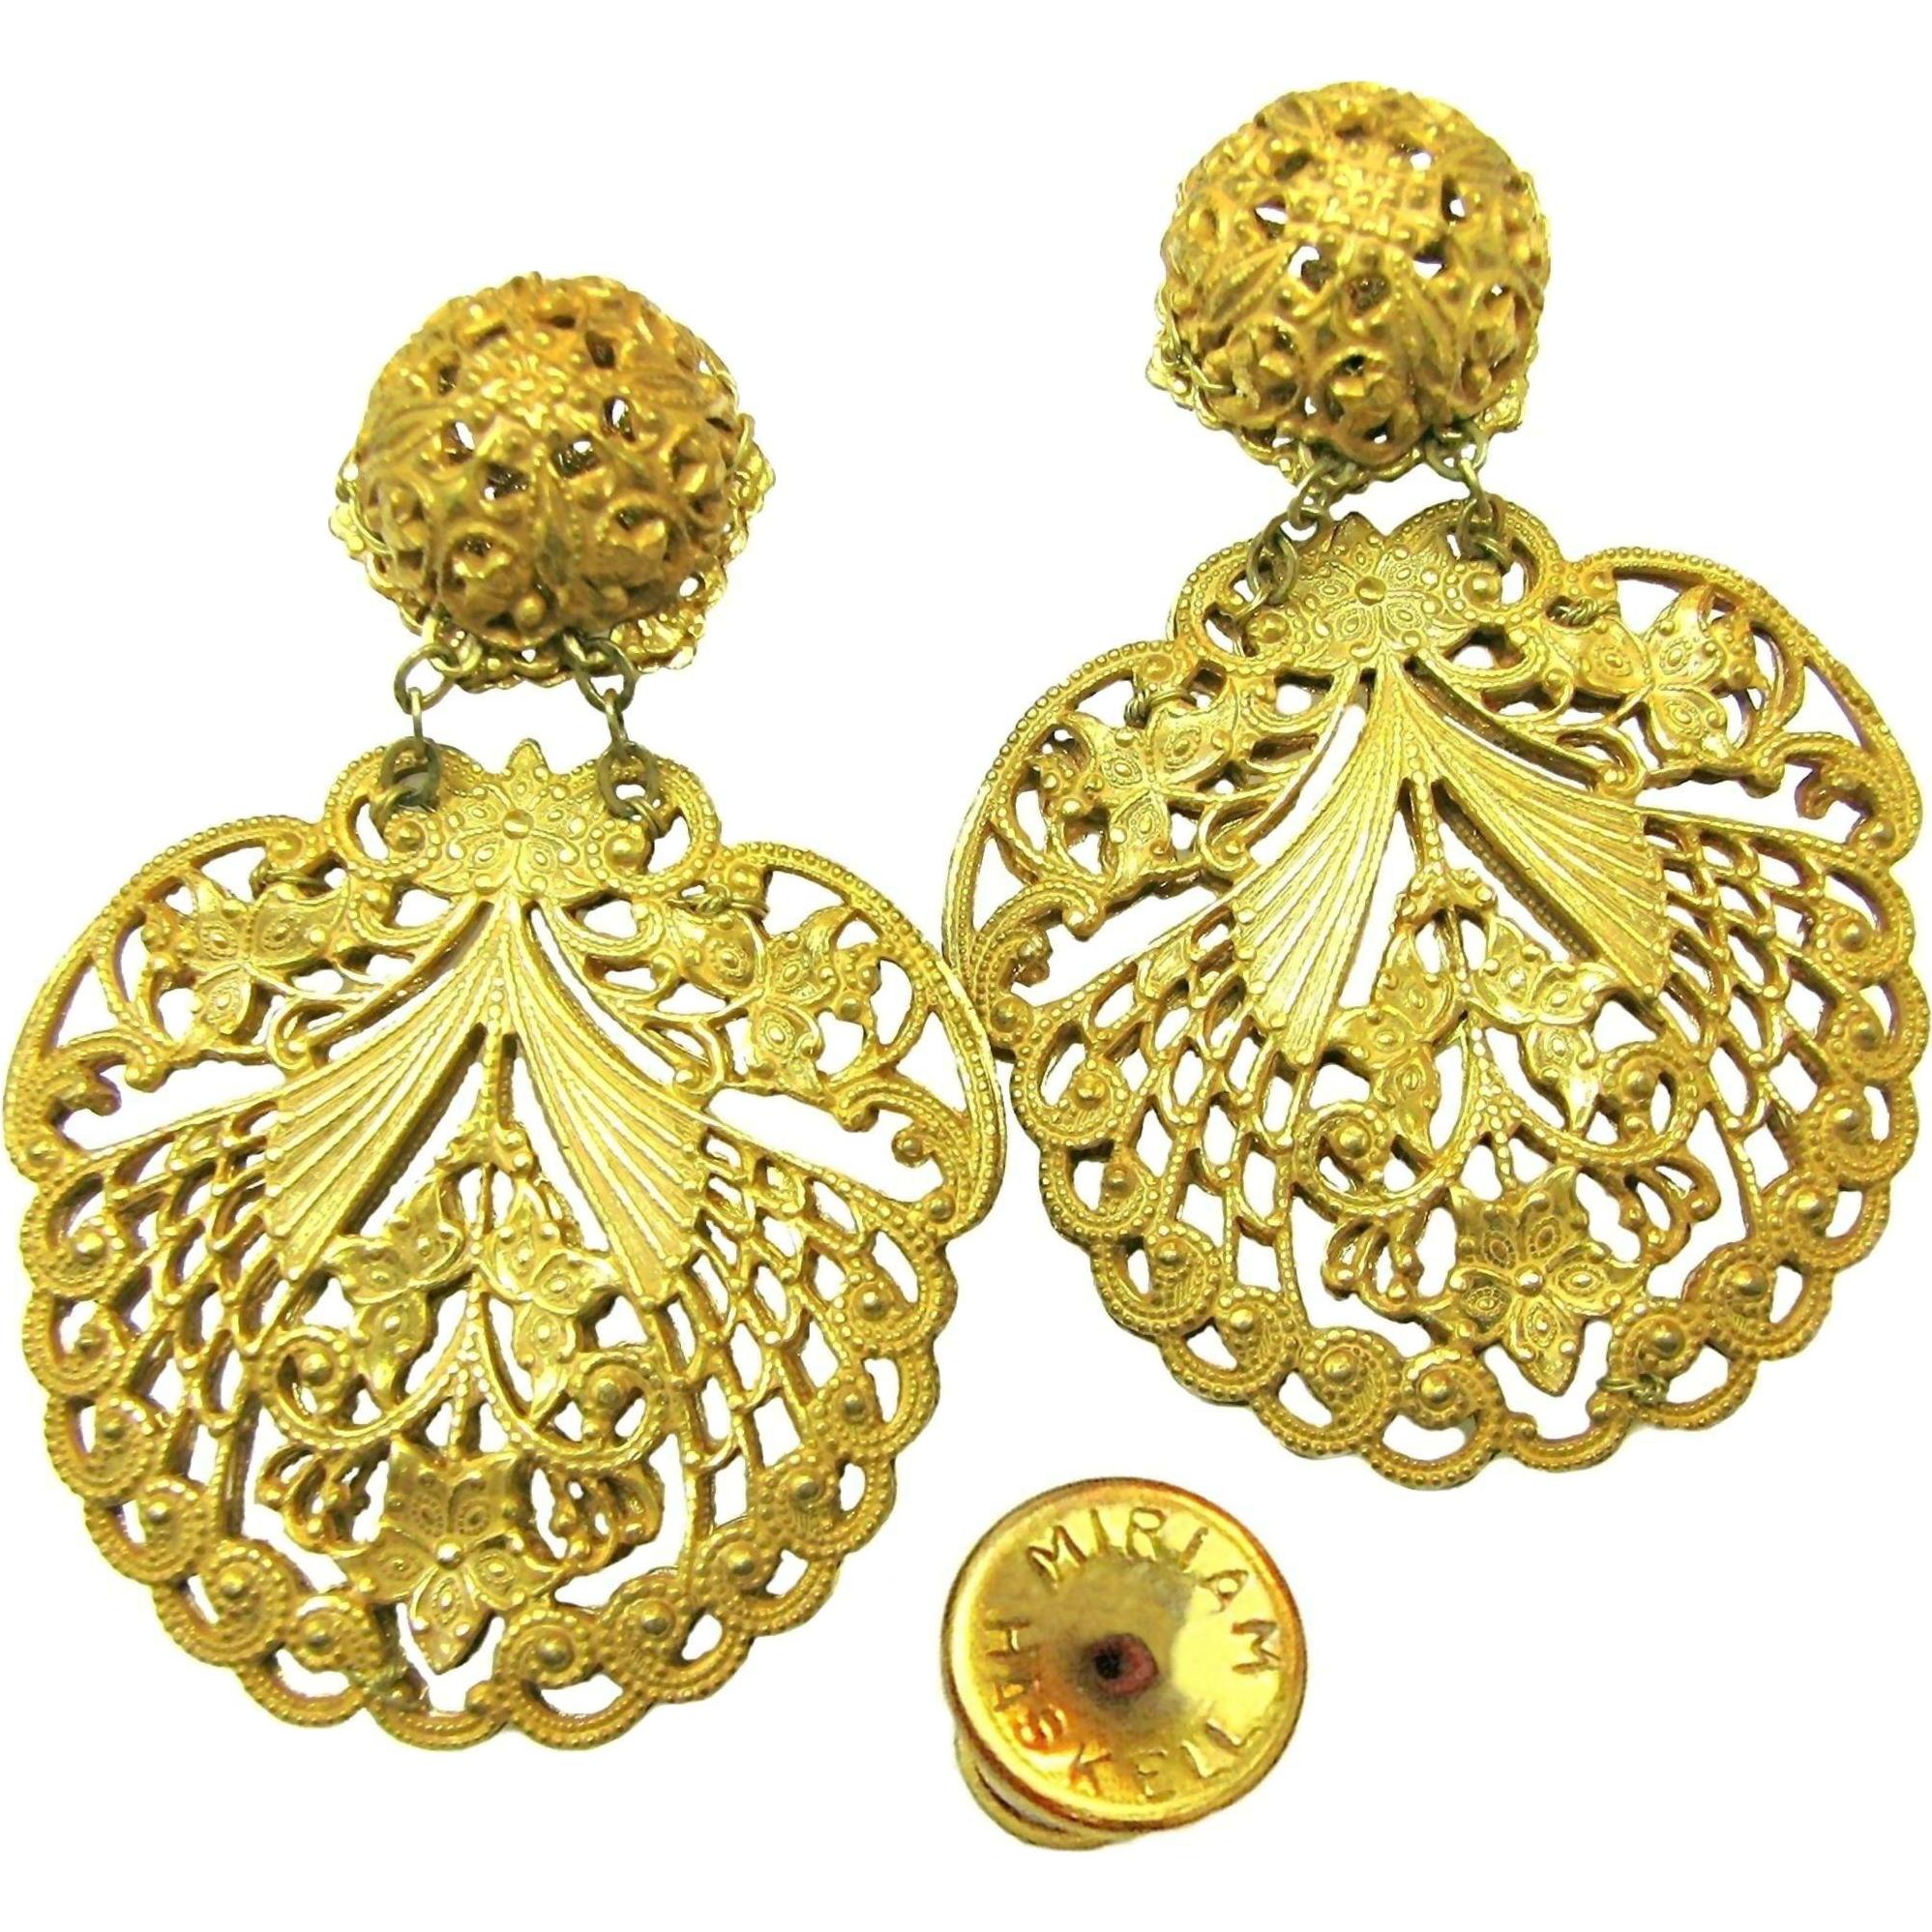 Vintage MIRIAM HASKELL PIERCED Earrings Ornate 'Lacey' Filigree Pendants